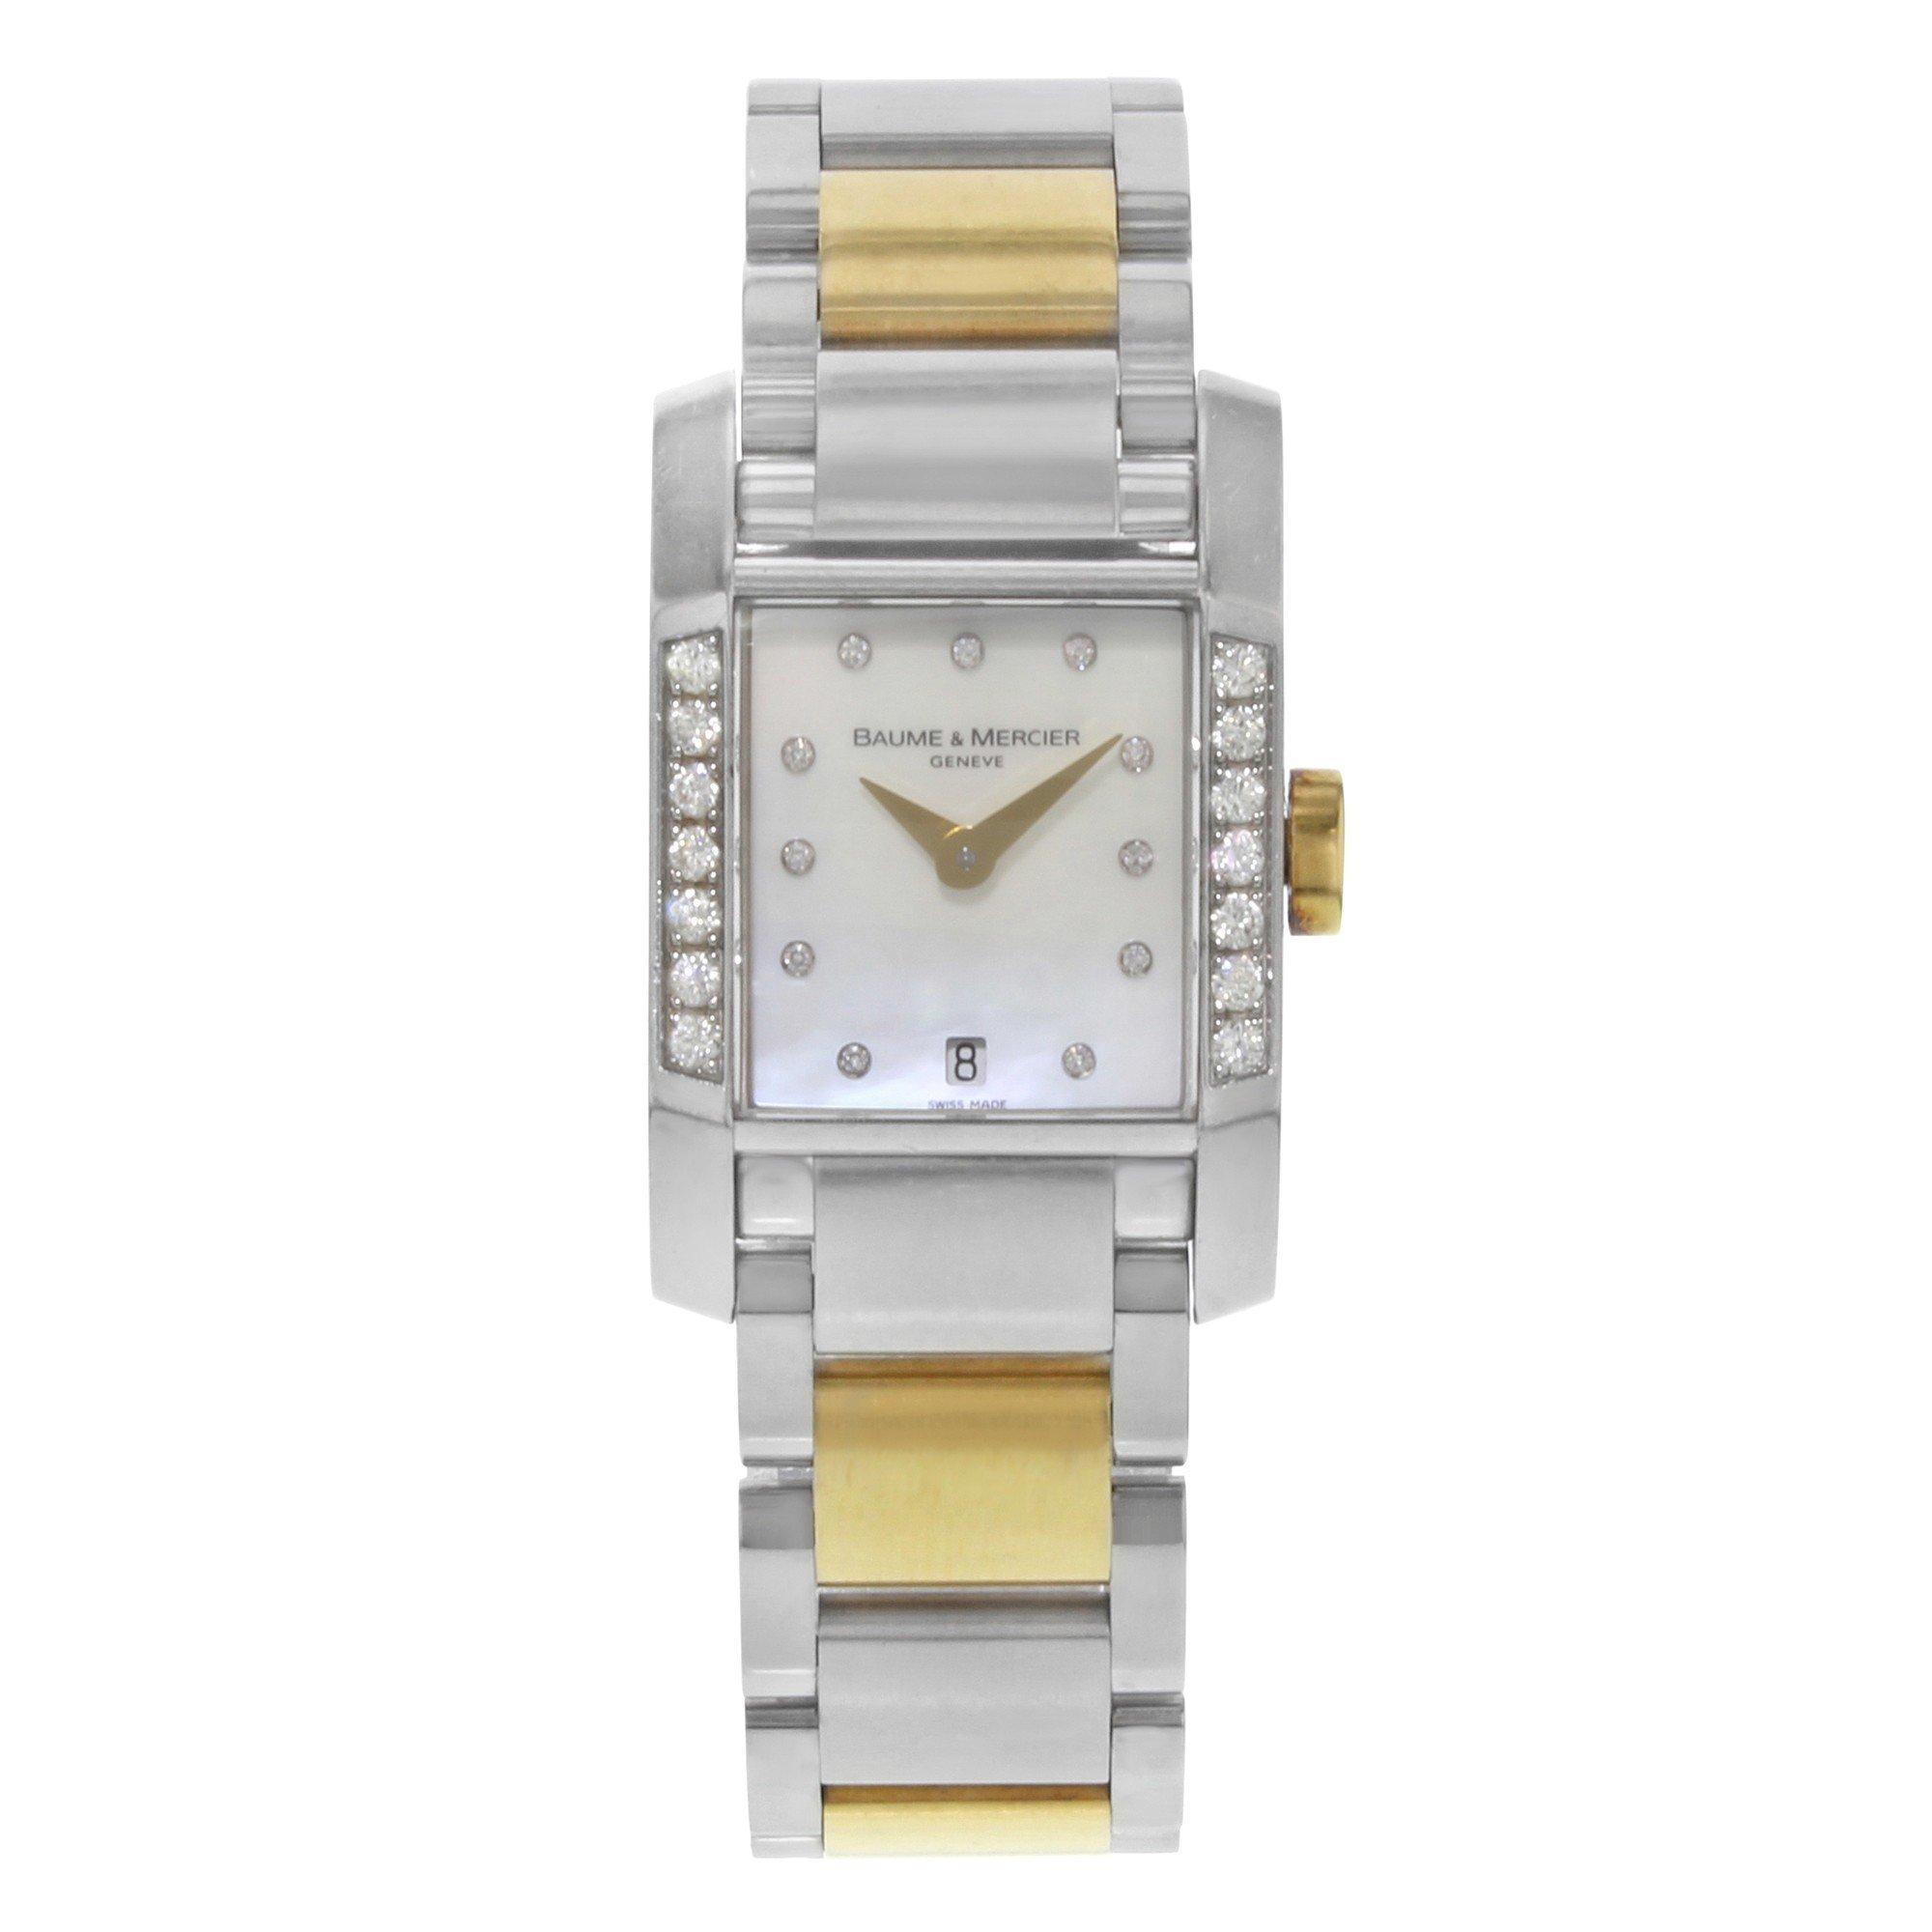 Baume & Mercier Deamant quartz womens Watch MOA08599 (Certified Pre-owned)